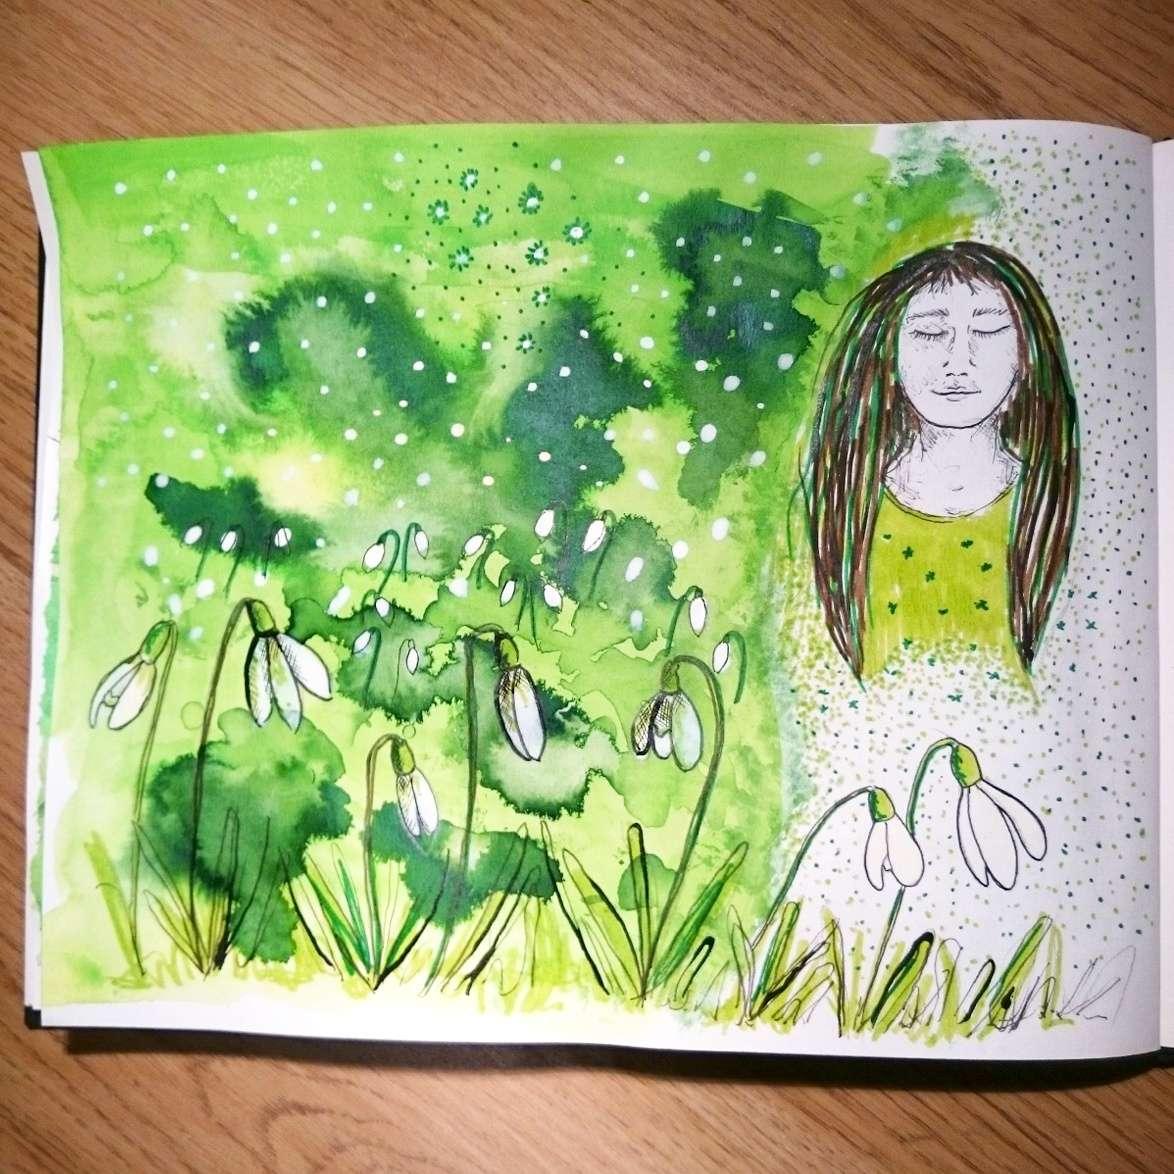 Day 3 28 Drawings Later Sketchbook Challenge by Jo Degenhart